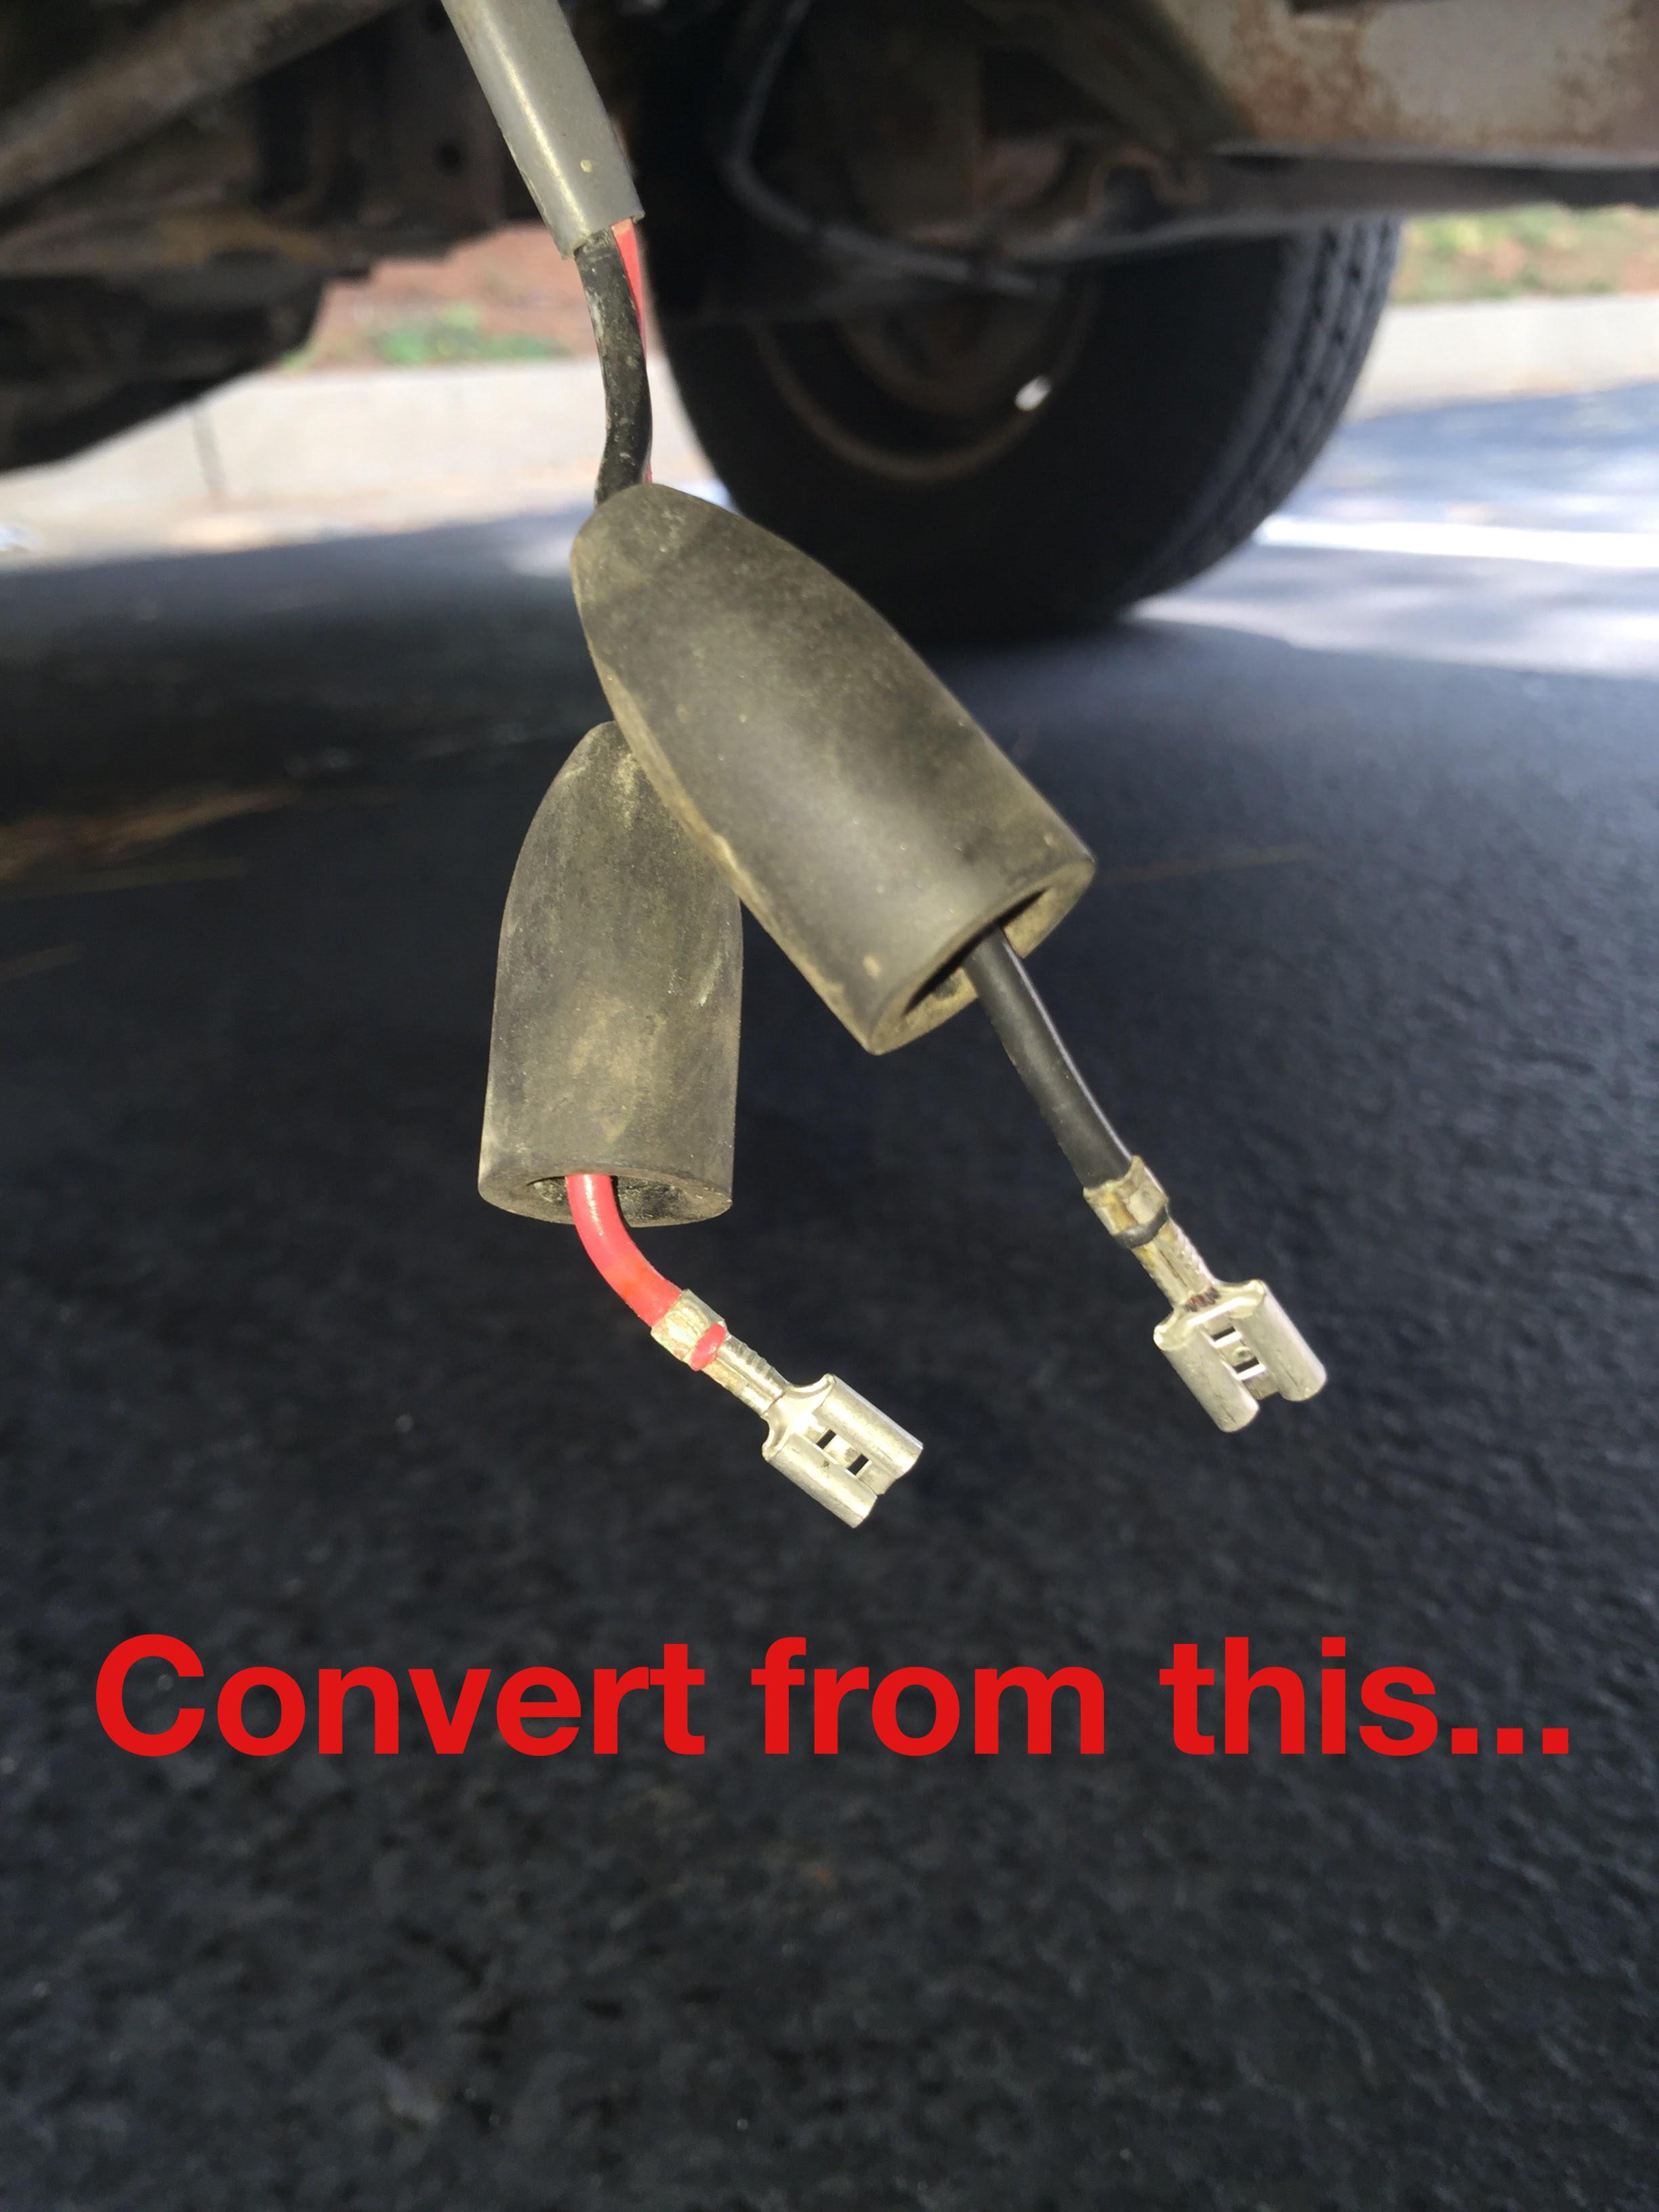 install-new-connectors-1.JPG